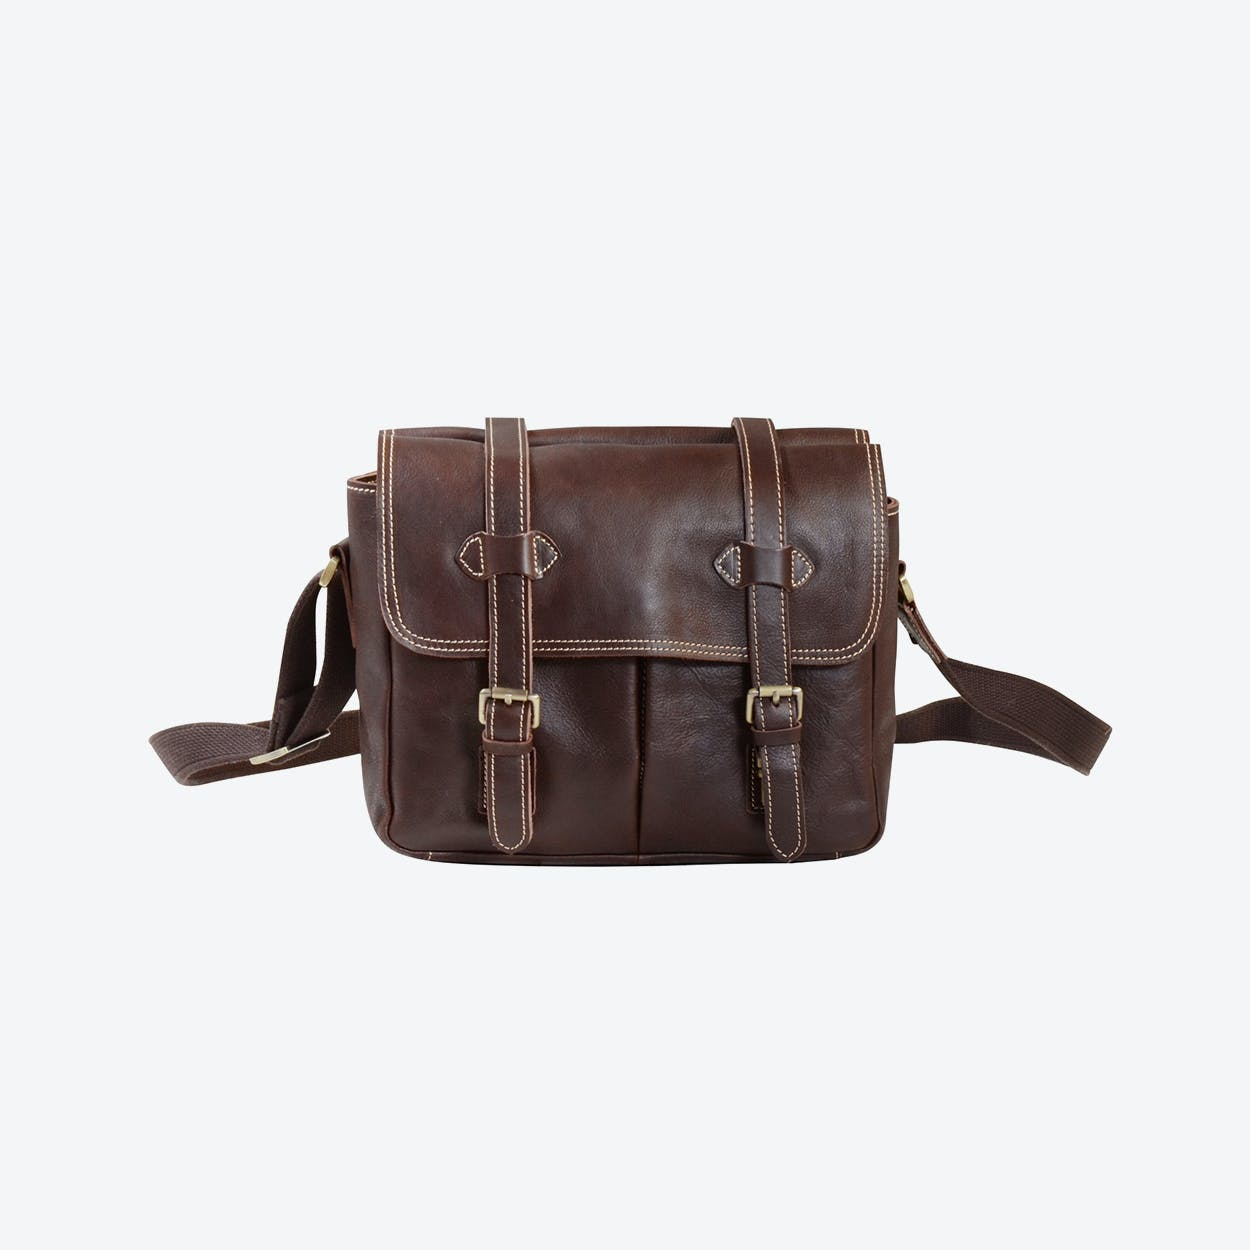 Leather Dslr Camera Bag in Dark Brown